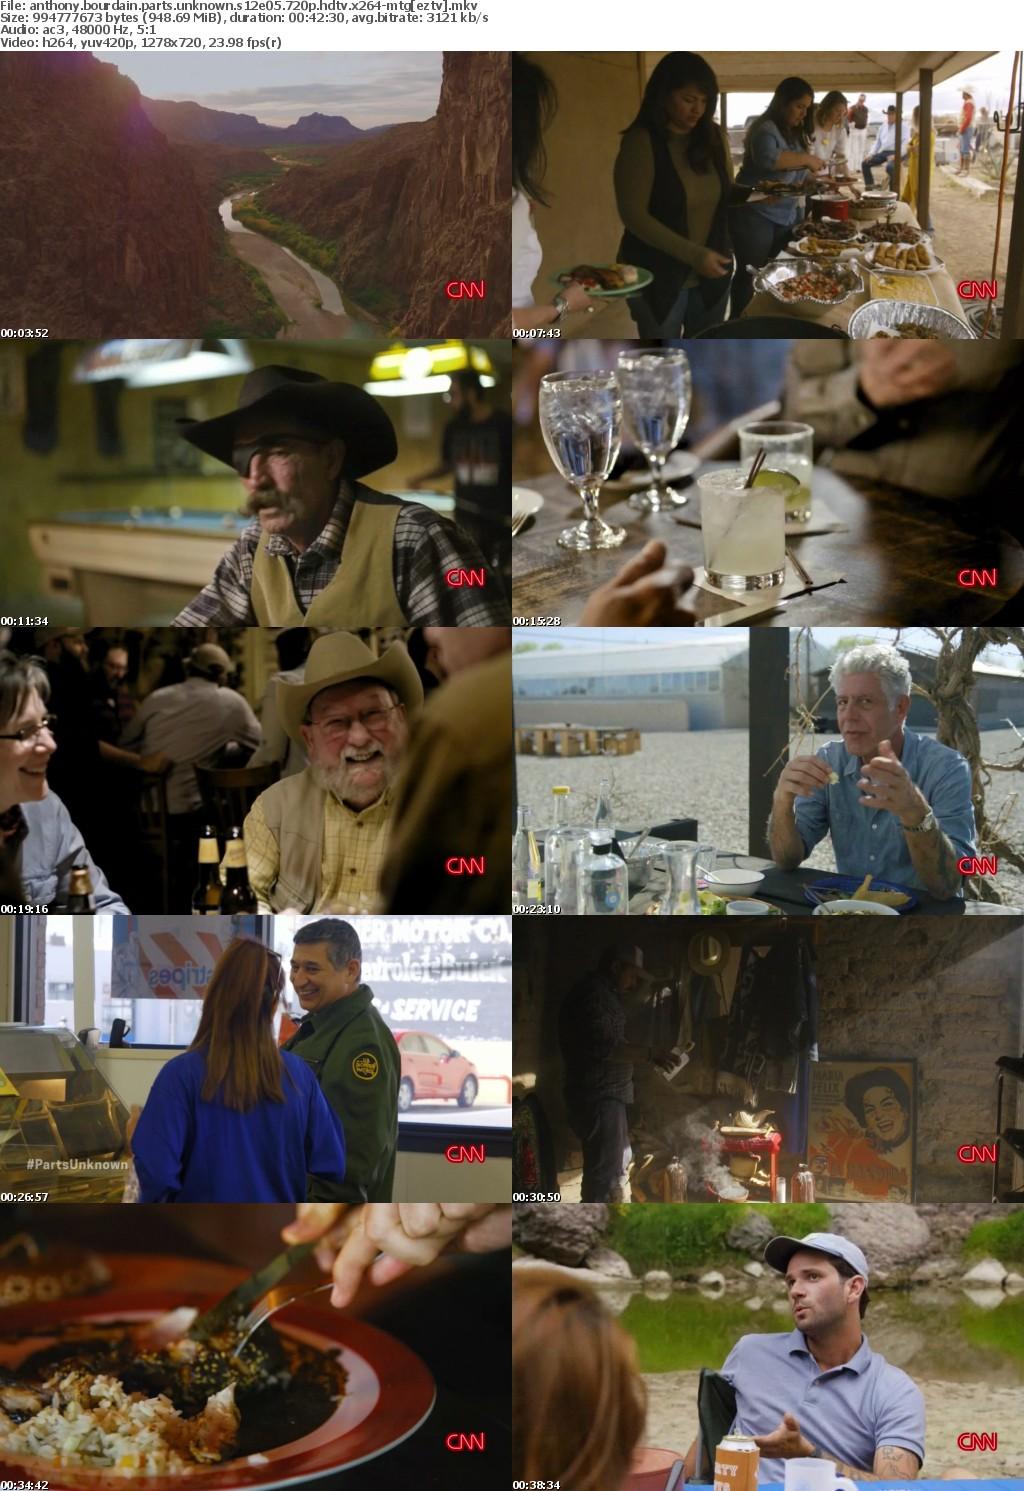 Anthony Bourdain Parts Unknown S12E05 Far West Texas 720p HDTV x264-MiNDTHEGAP